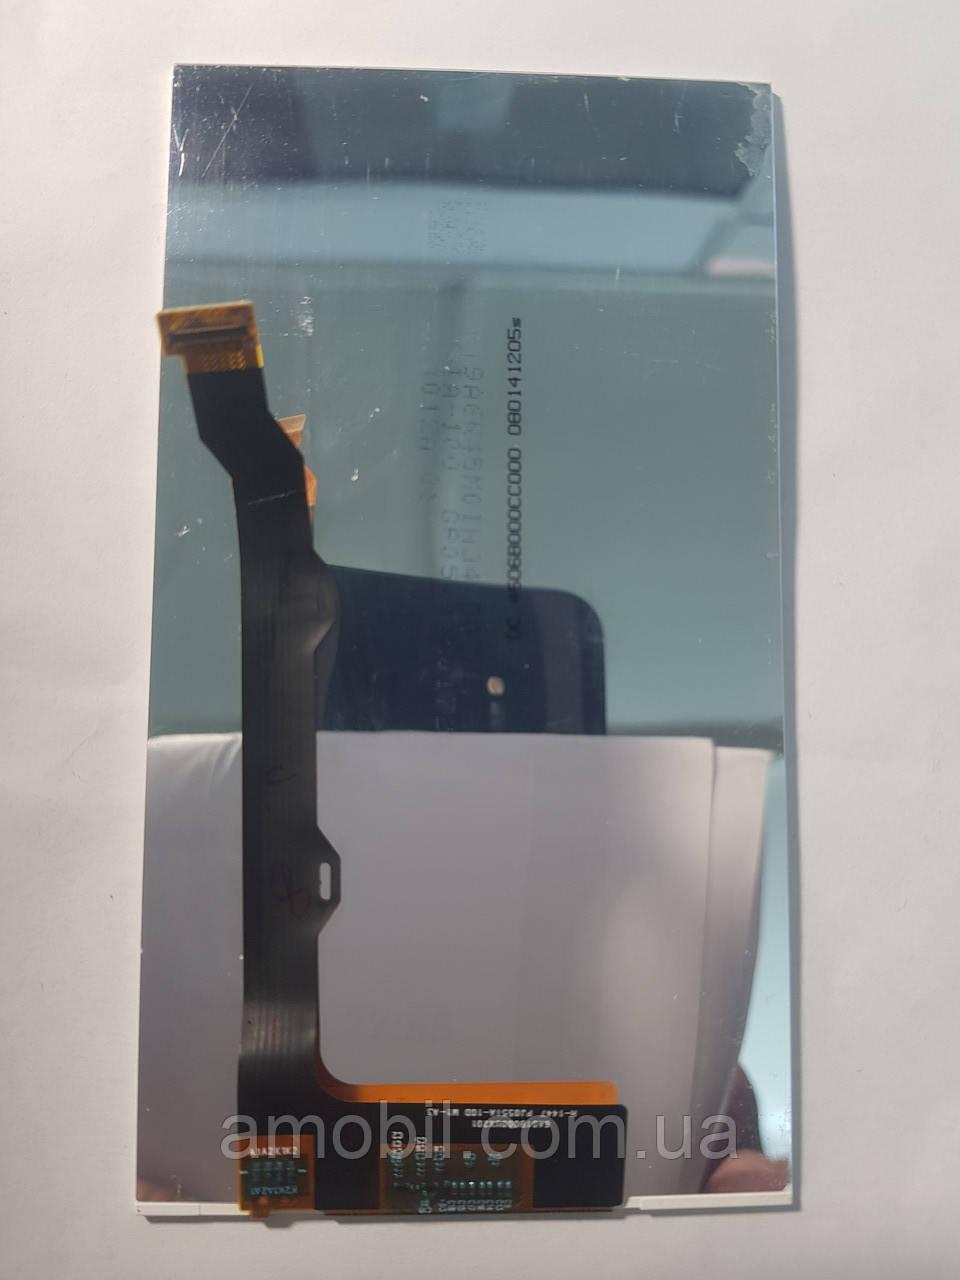 Дисплей Lenovo A7000 Plus K3 Note (K50-T3S) (K50-T5) S8 A7600 orig